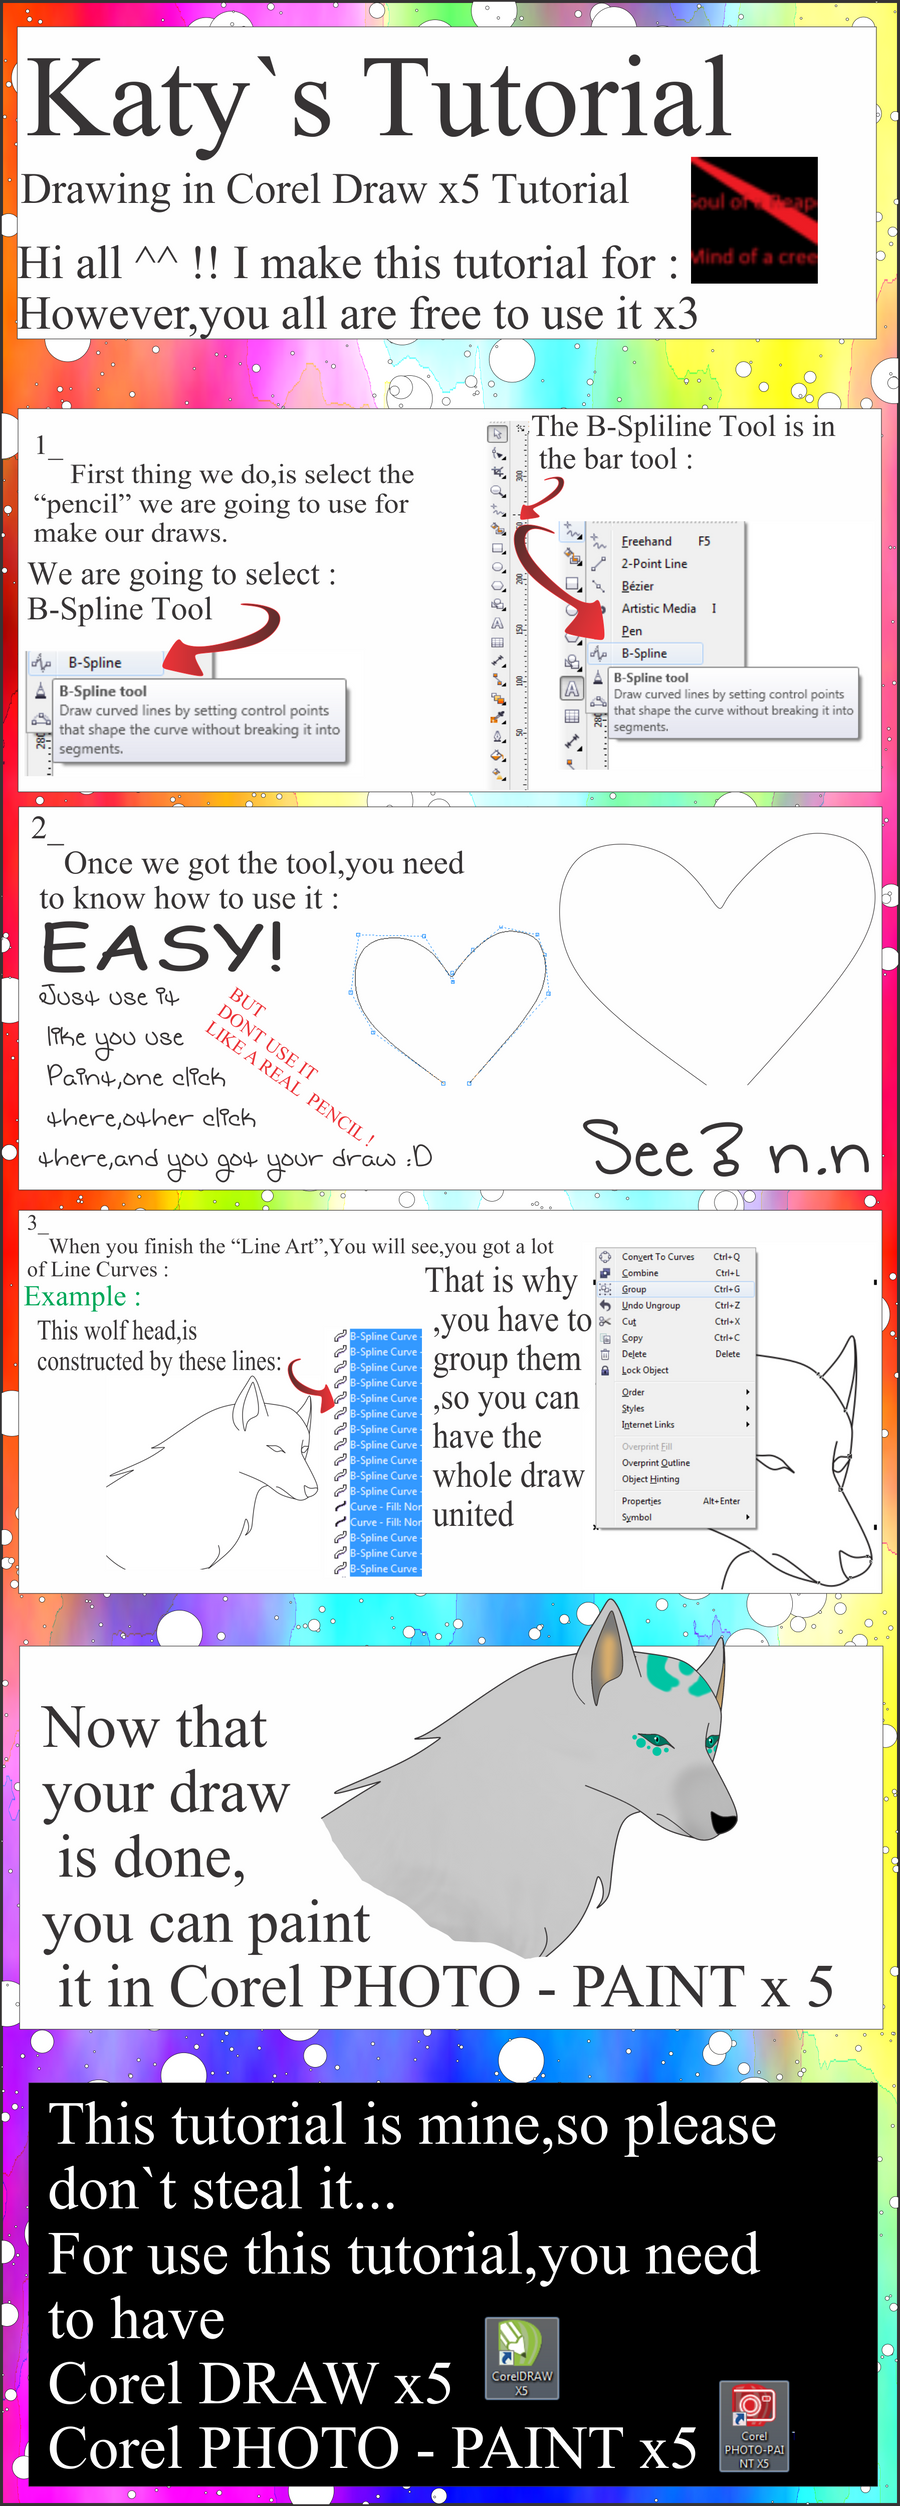 Line Art Corel Draw Tutorial : Corel draw tutorial by chezasnowwolf on deviantart